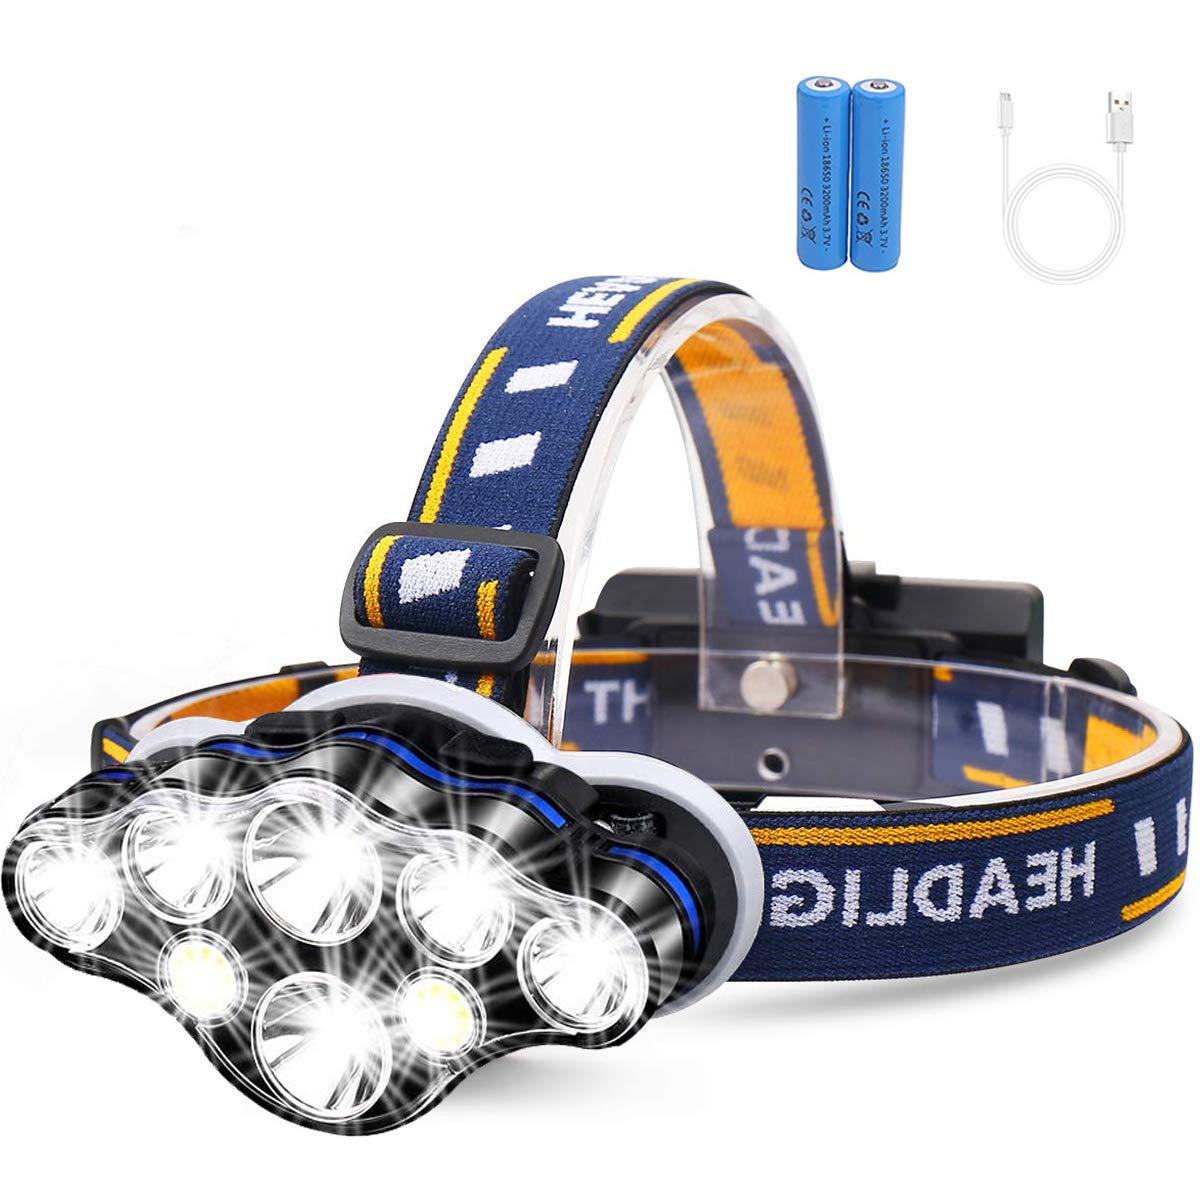 8 LED USB Rechargeable Waterproof Headlamp